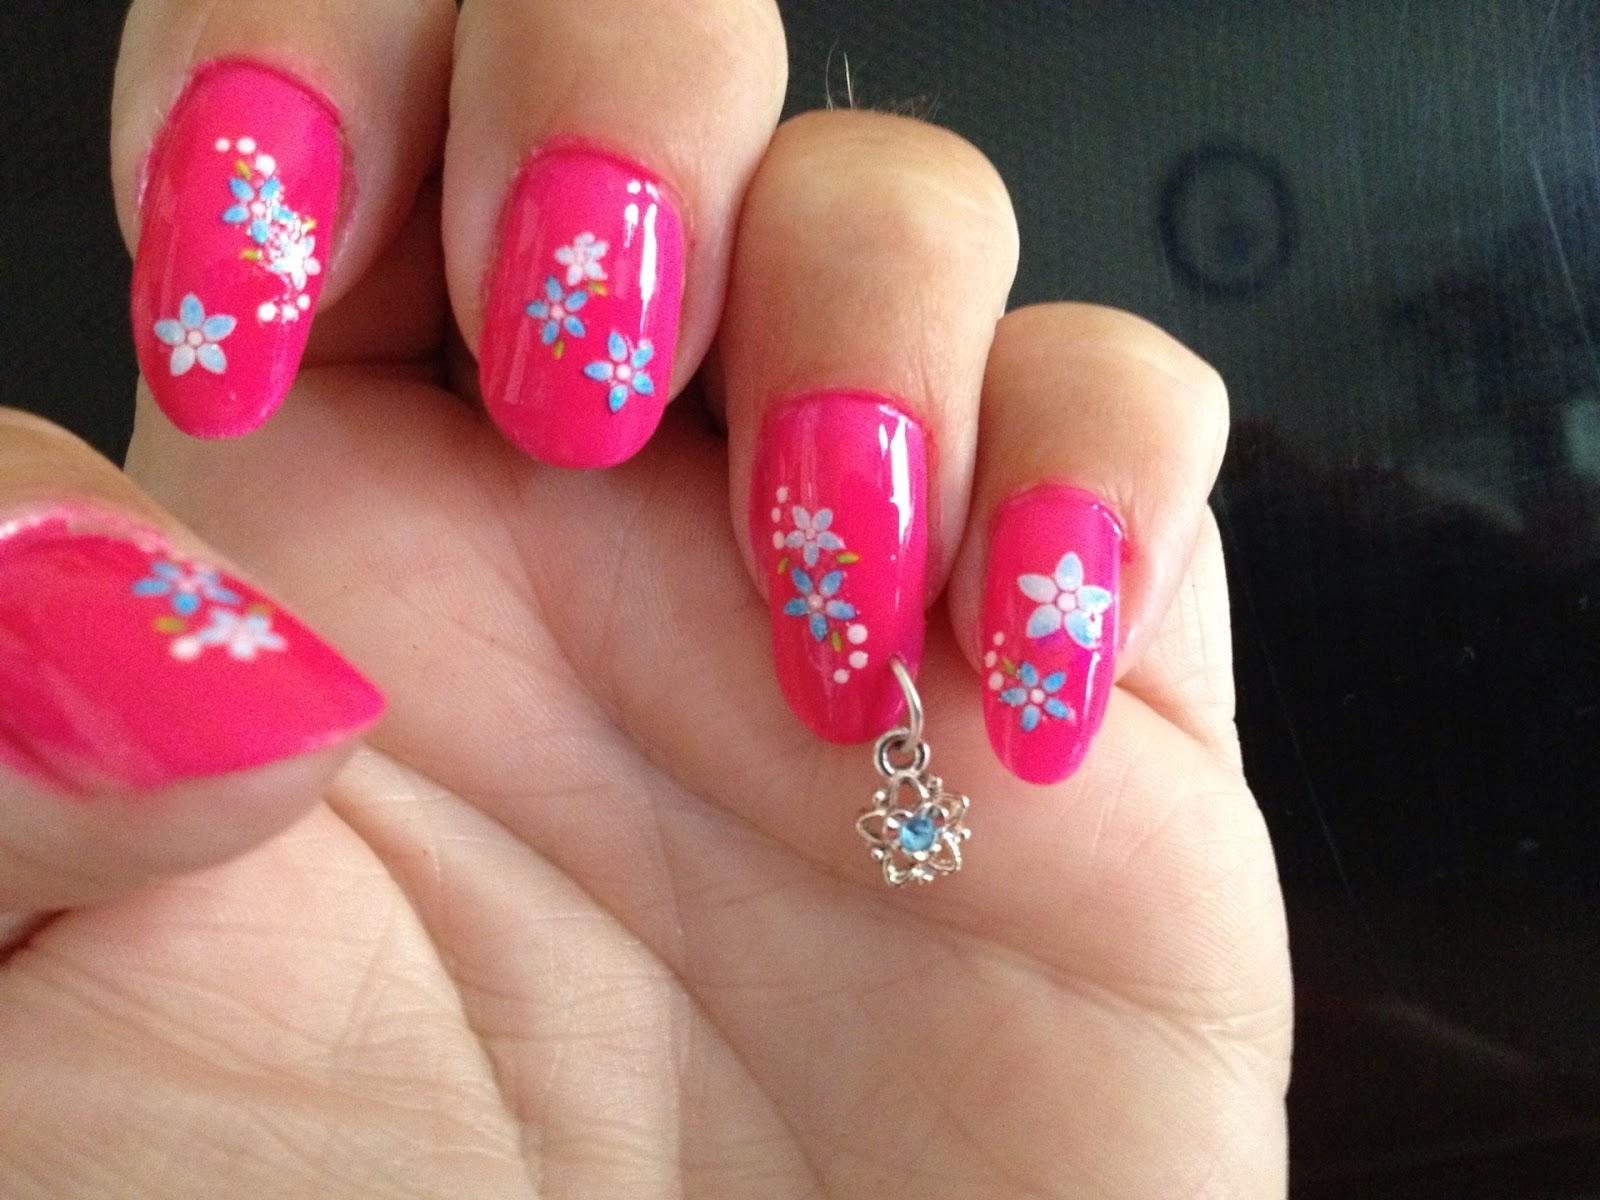 Mandyu0026#39;s Nail Shop U0026 DIY Blog Nagel Piercing